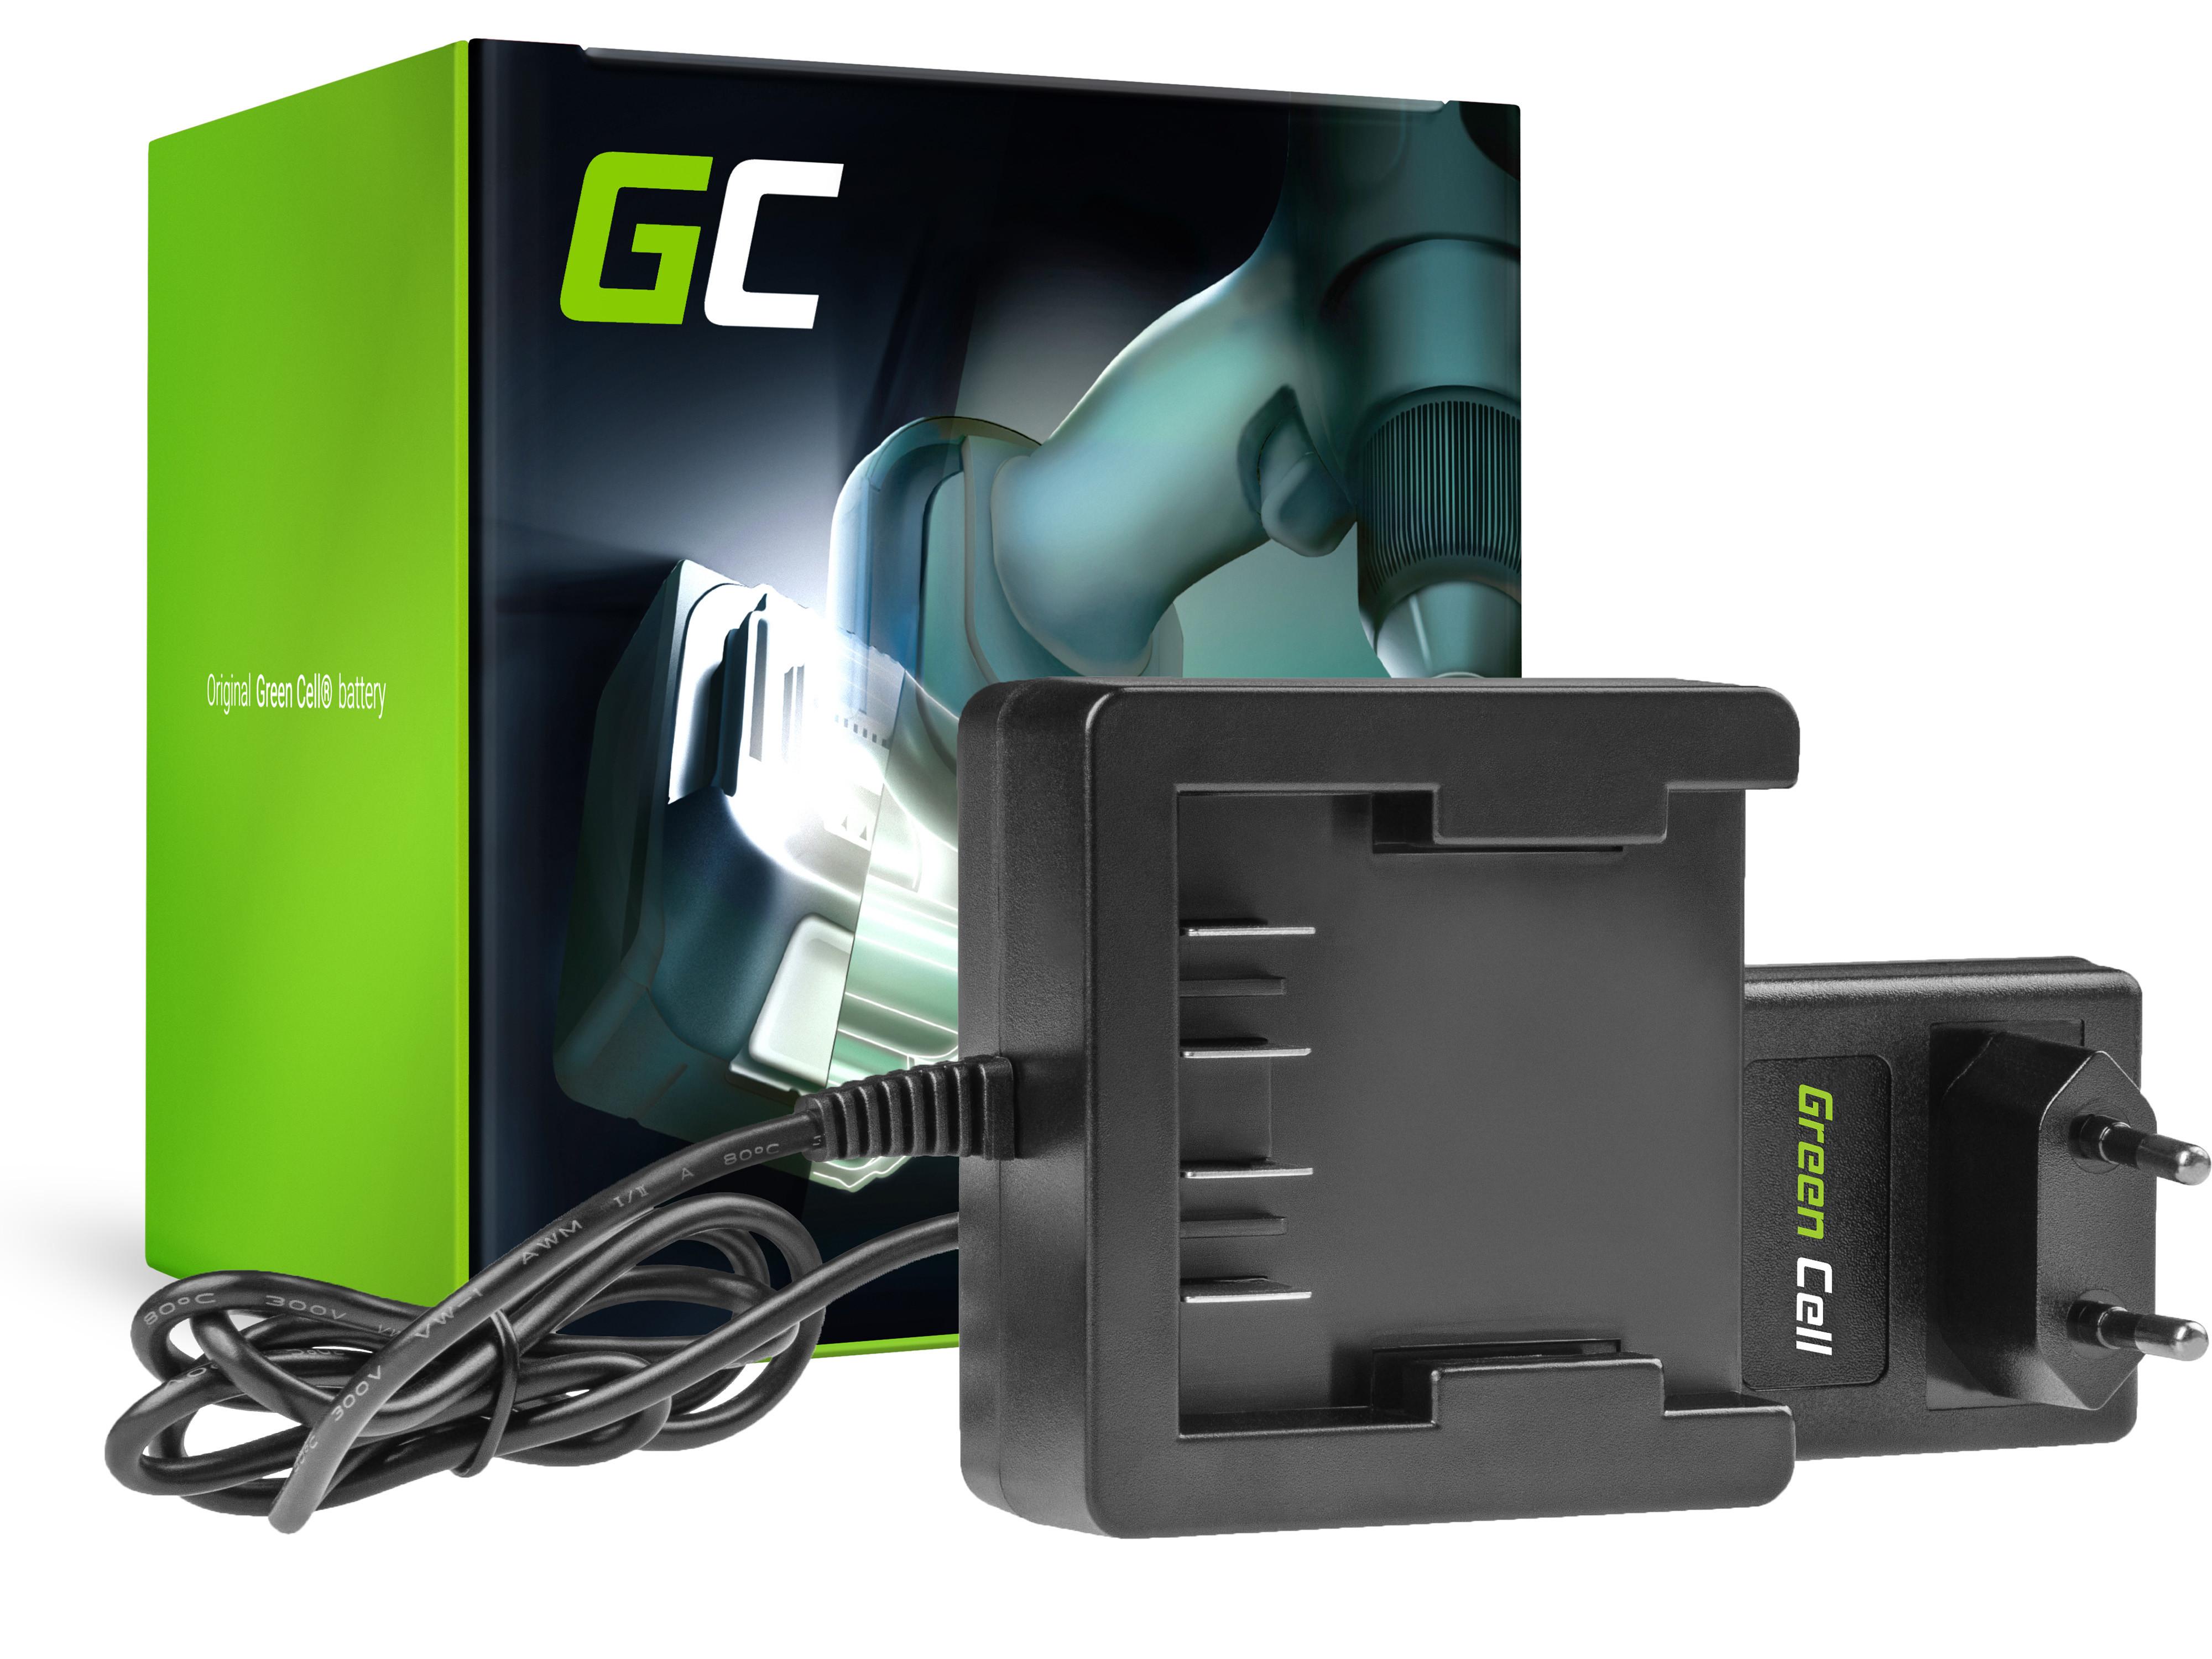 Green Cell Charger 29862 29702 25.2V GreenWorks 21.6-24V Li-Ion 29842 29852 G24 G24B2 G24CD GD24IW